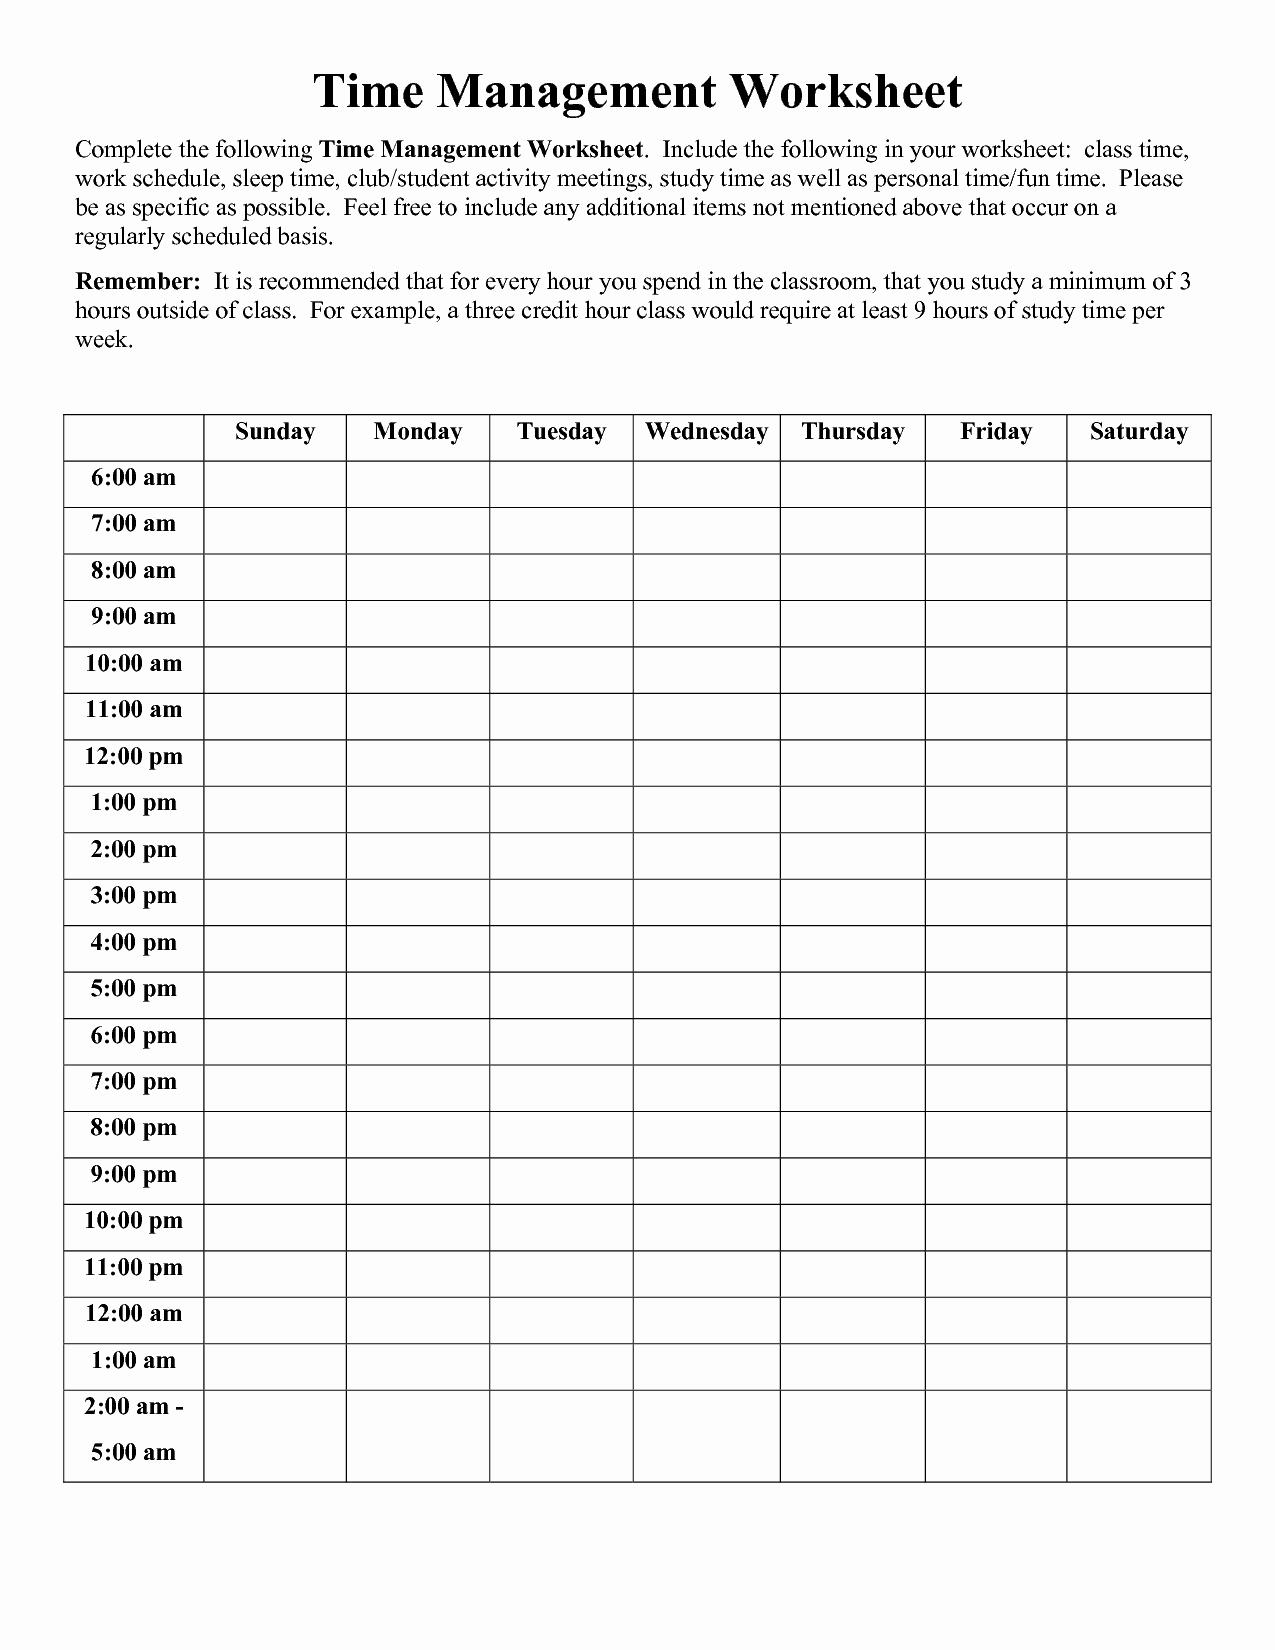 Time Management Log Template Awesome Time Management Worksheet Pdf sophia